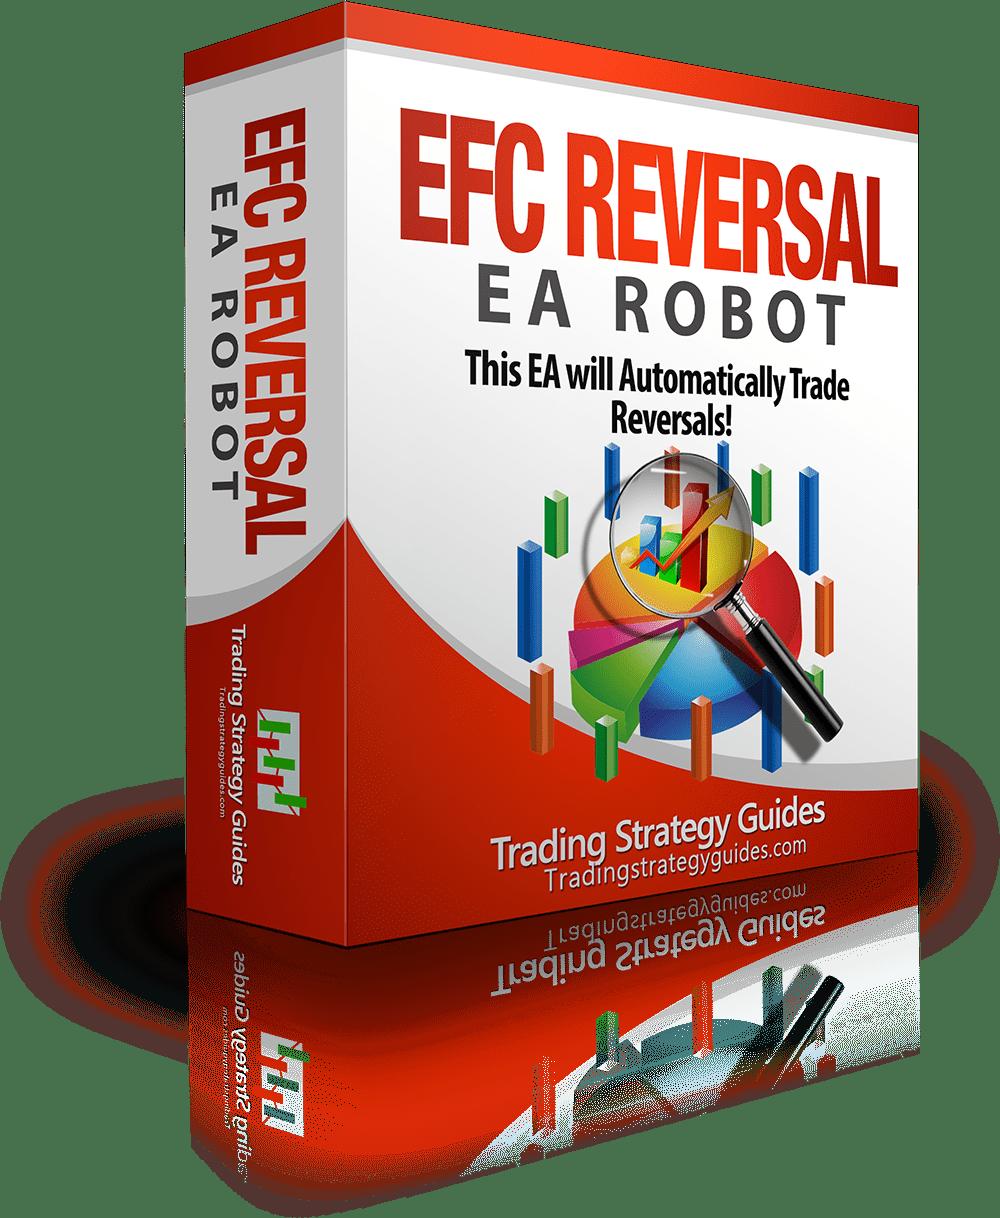 efc reversal trading strategies